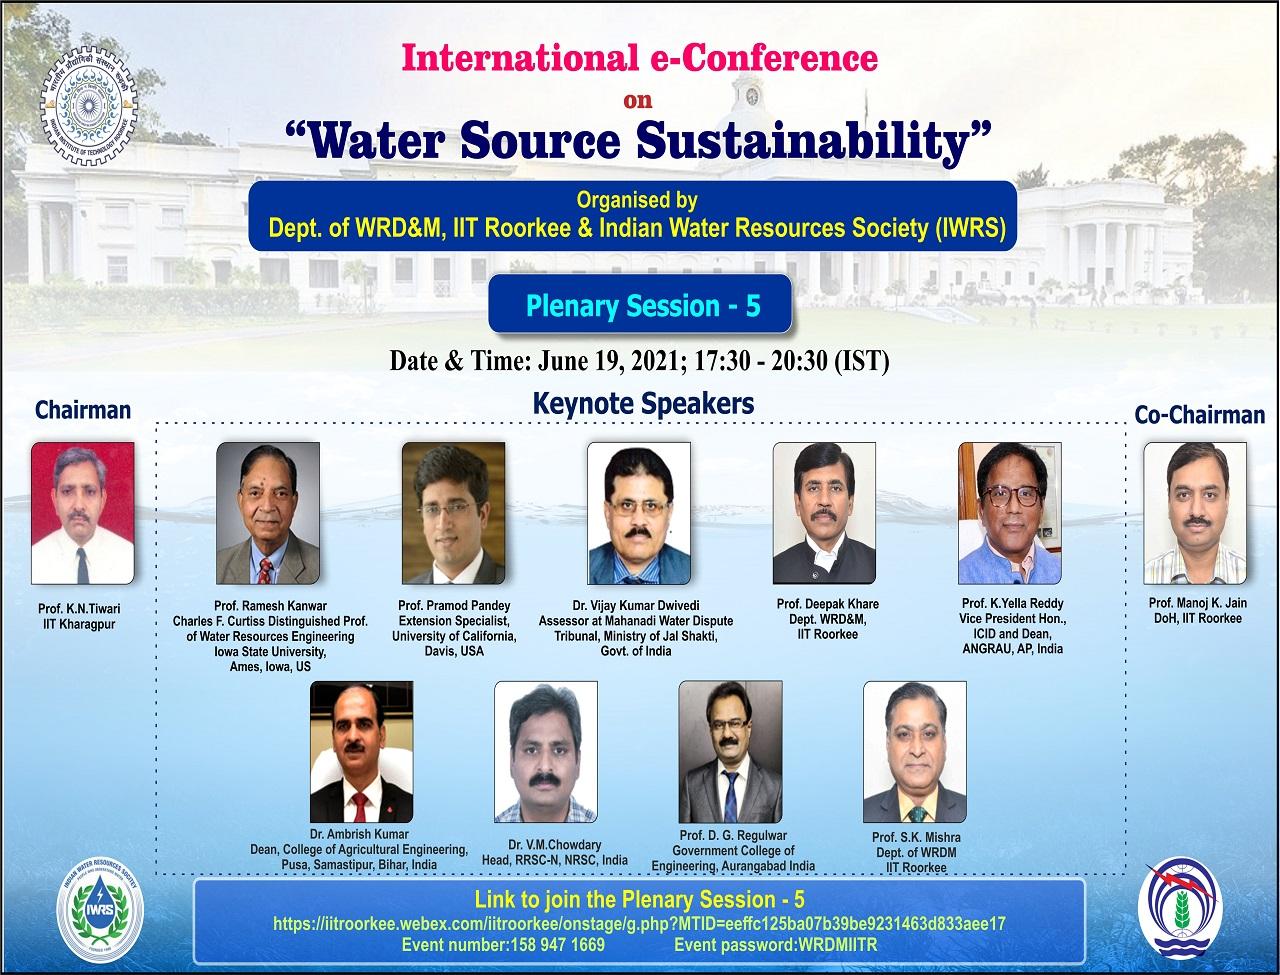 Plenary Session 5